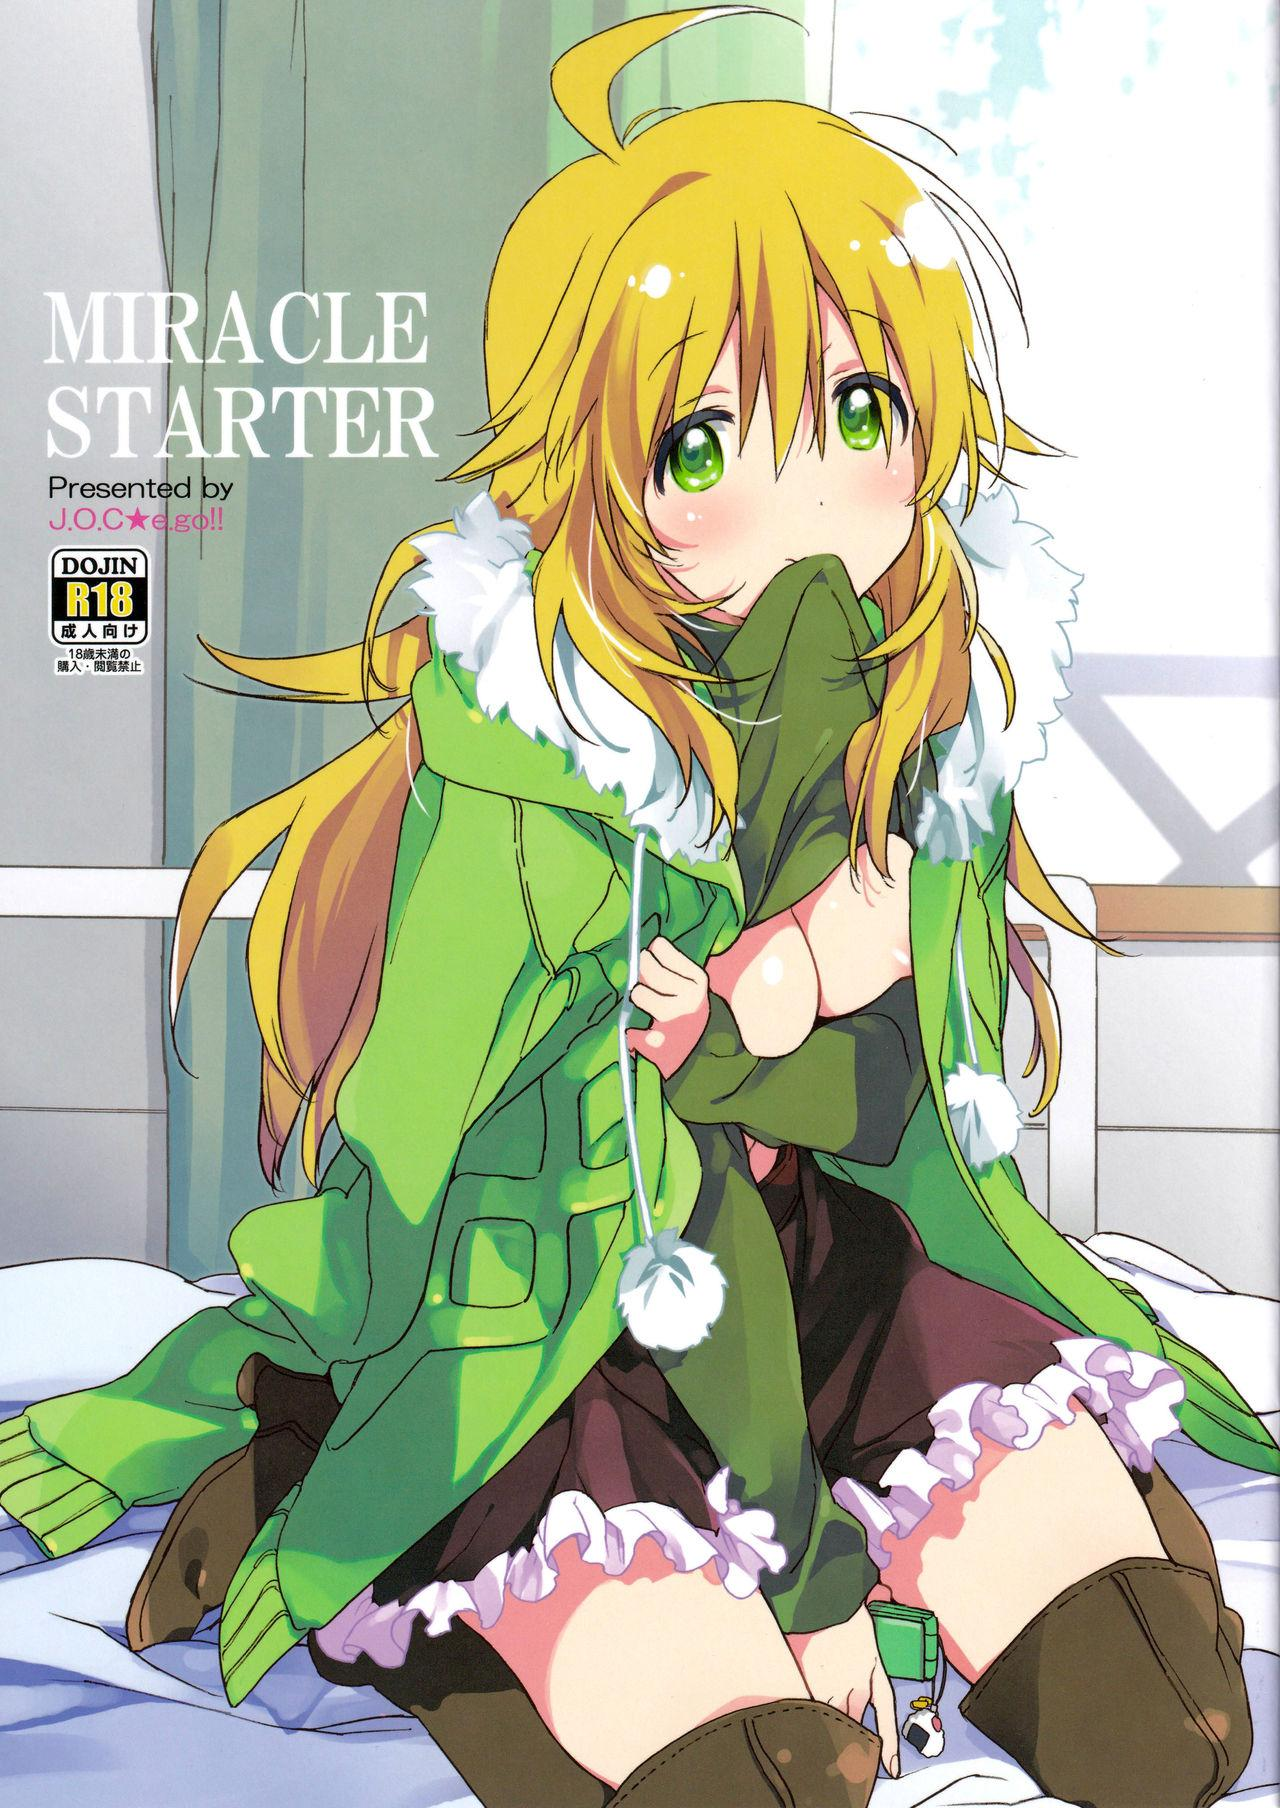 MIRACLE STARTER 0